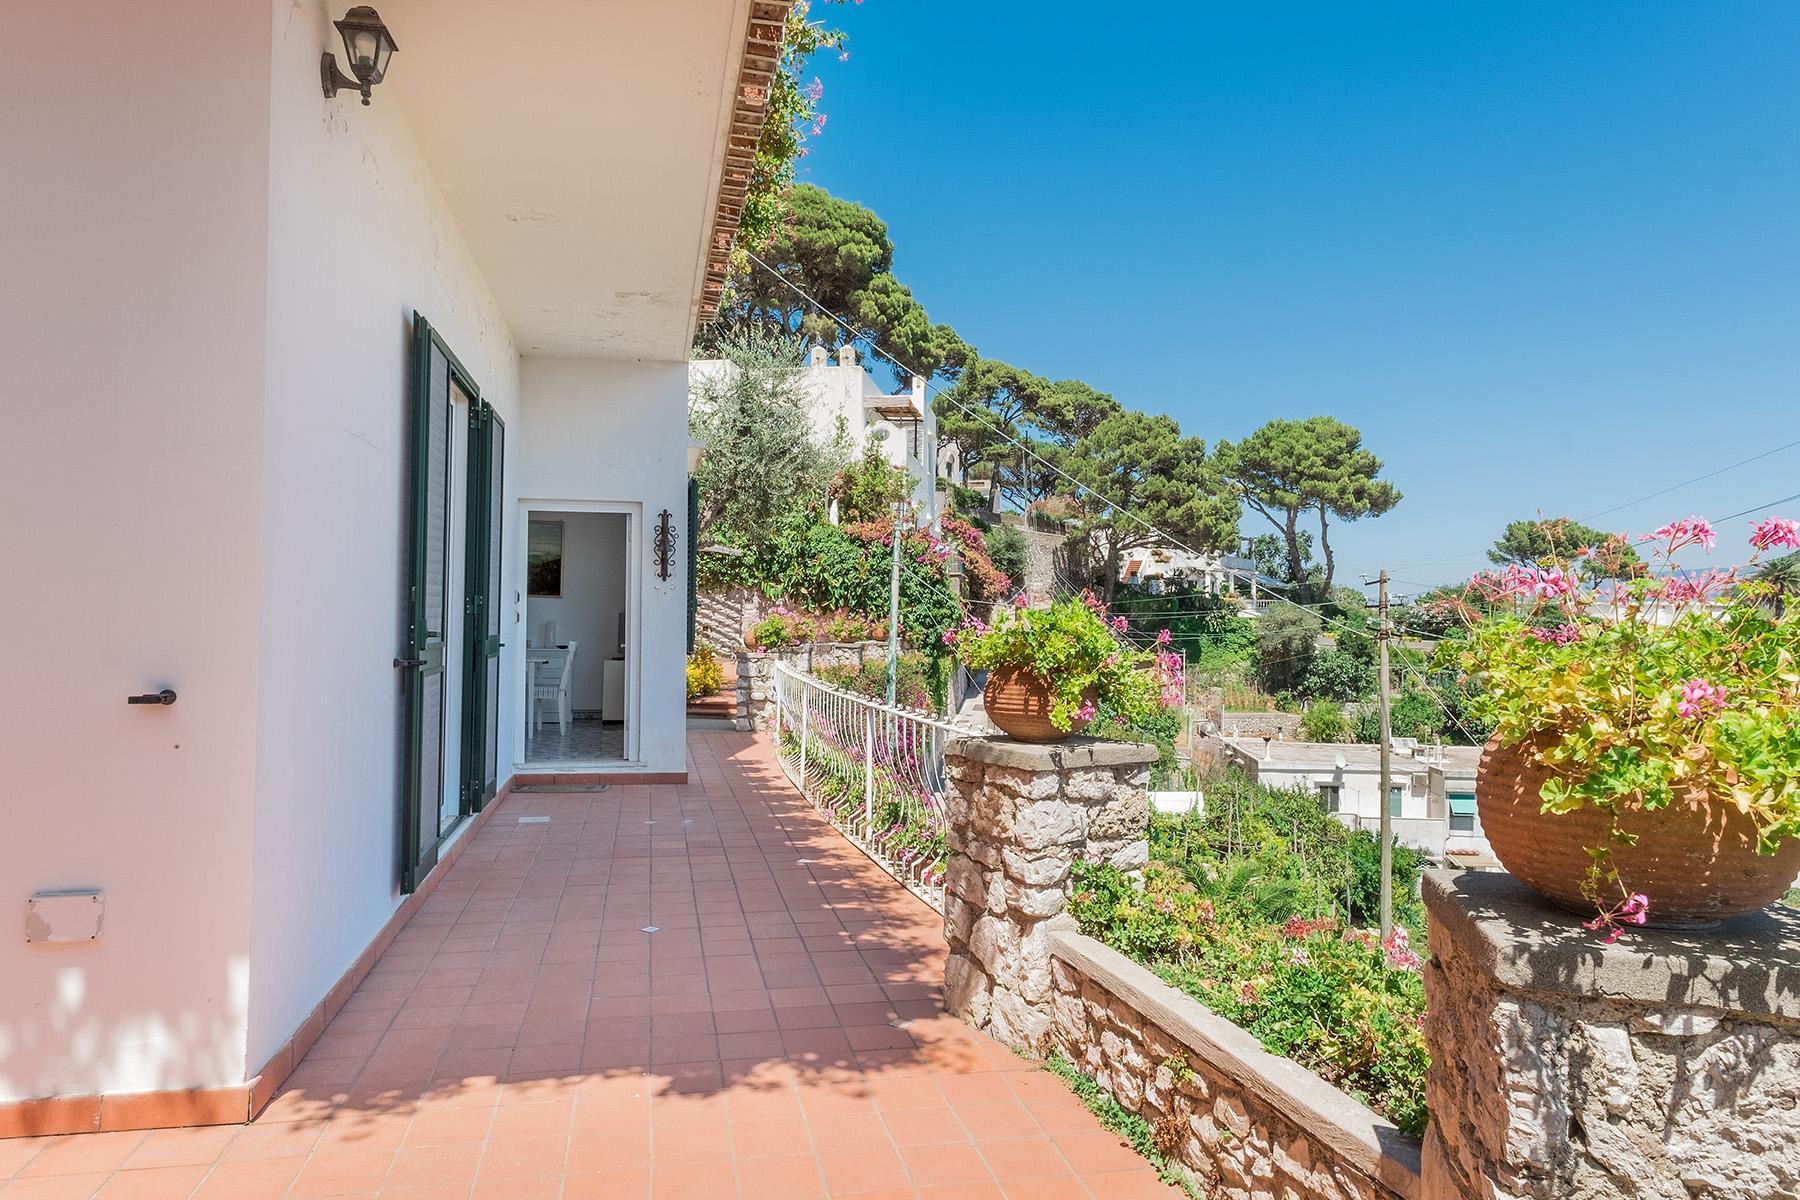 Прекрасная вилла с панорамным видом на море в центре легендарного острова Капри, Италия - 18